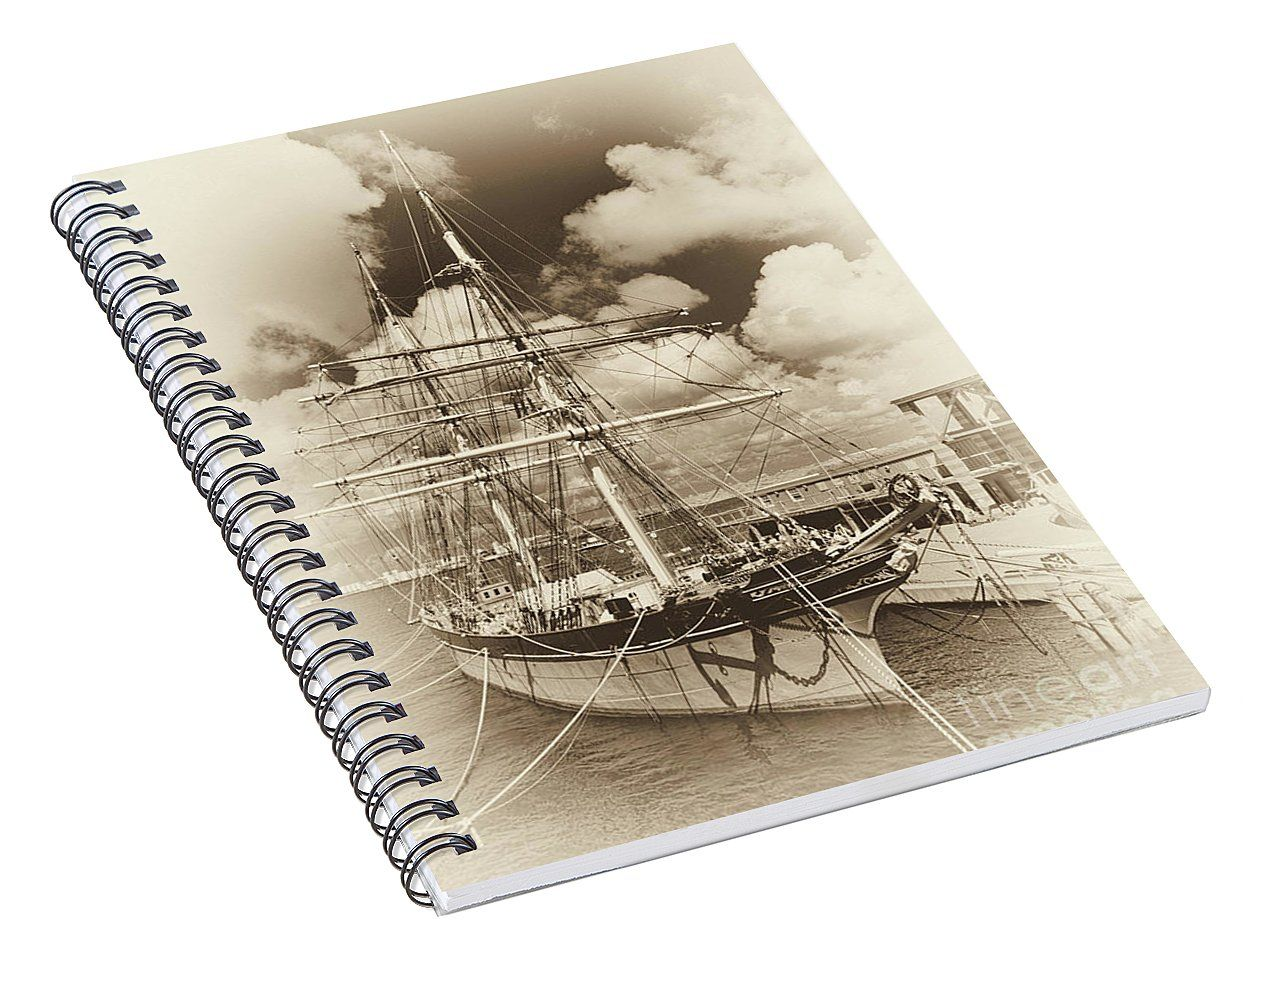 Isometric view tall ship elissa by norman gabitzsch houston photographer spiralnotebook